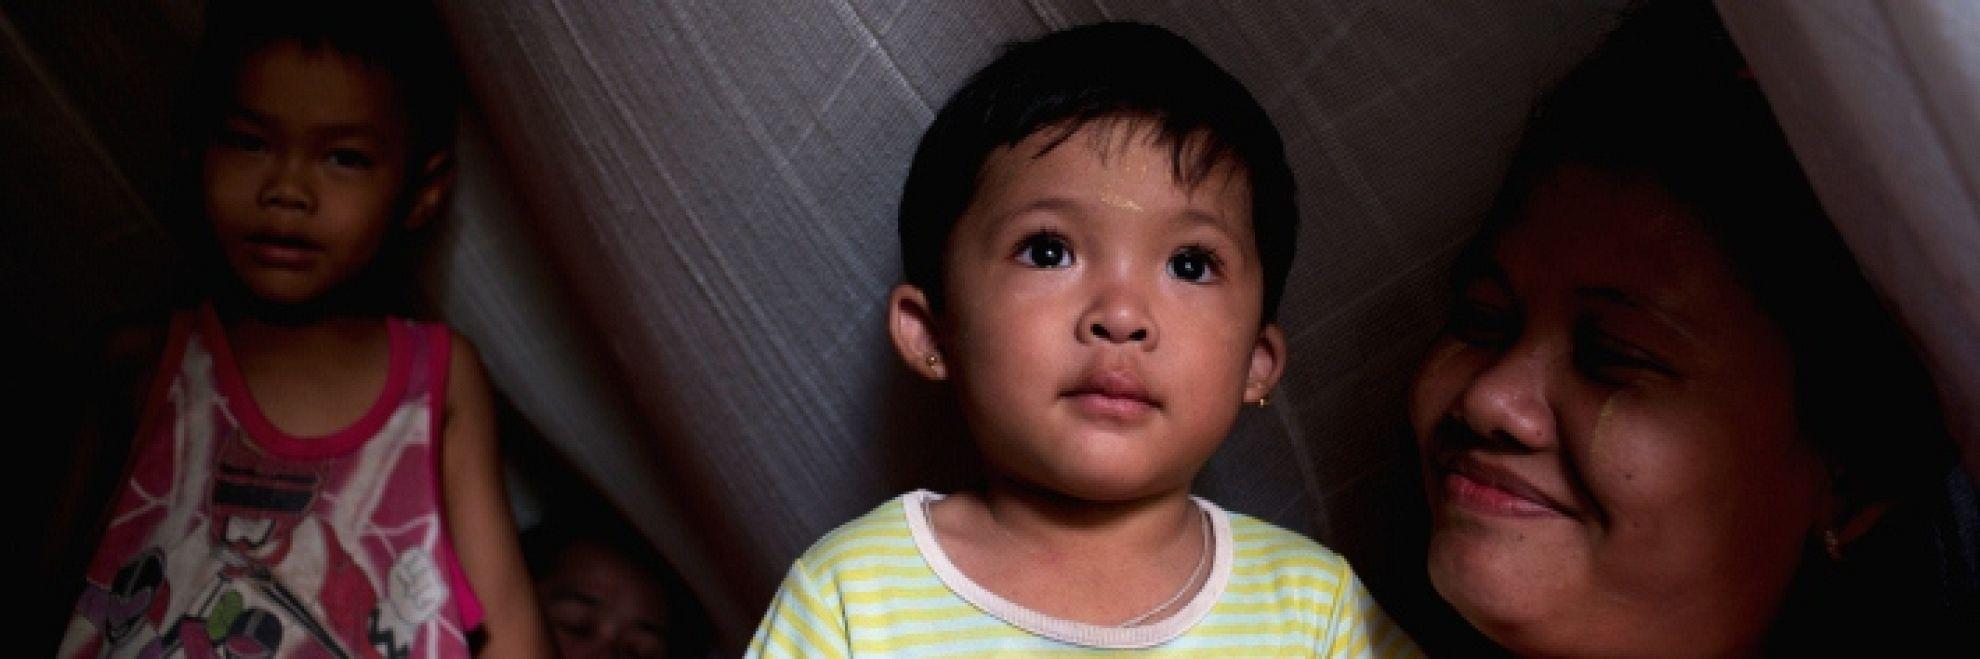 Latest News World health organization world malaria report 2011 released